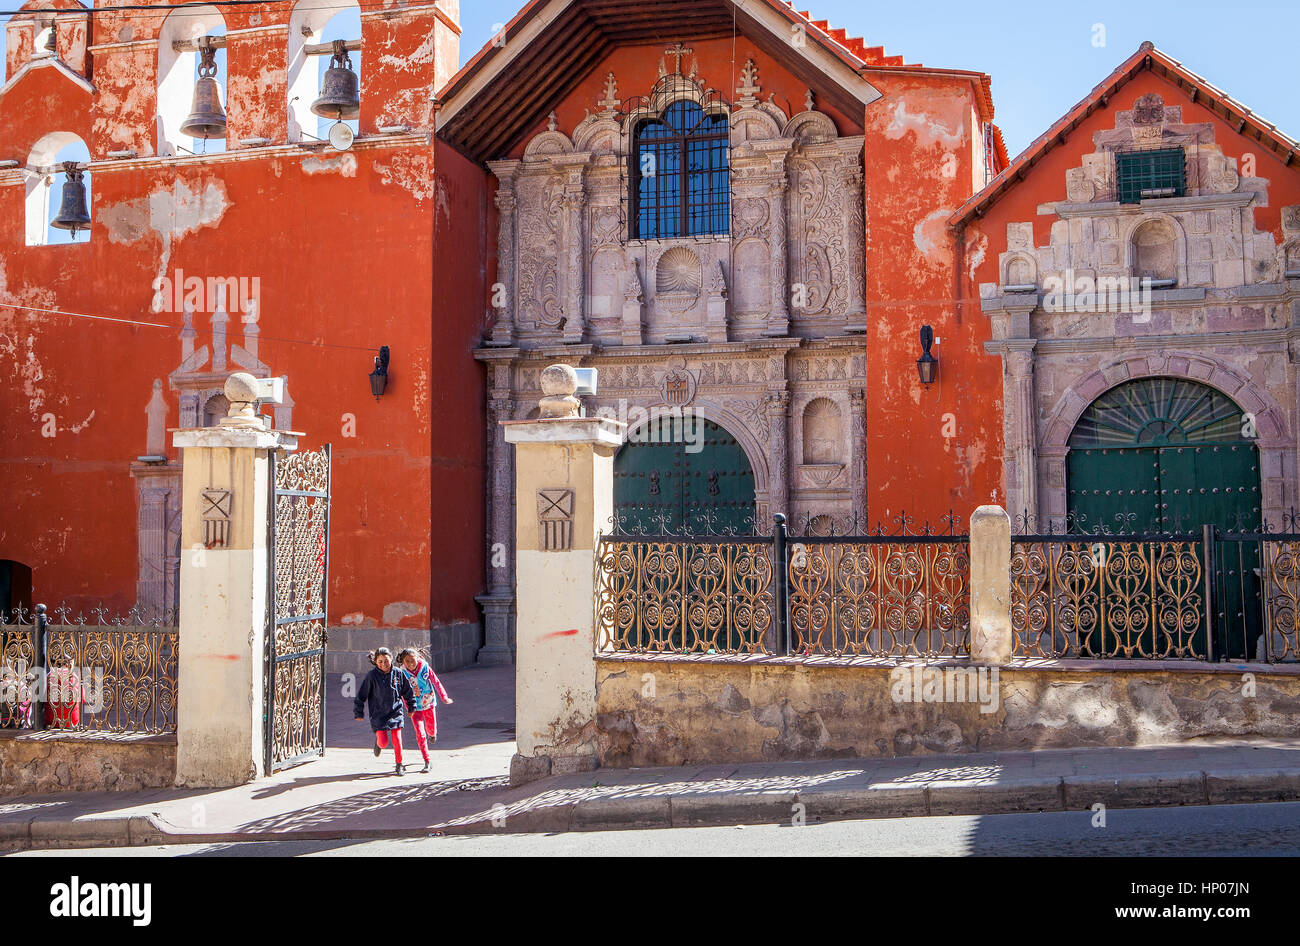 Church of La Merced, Potosi, Bolivia - Stock Image